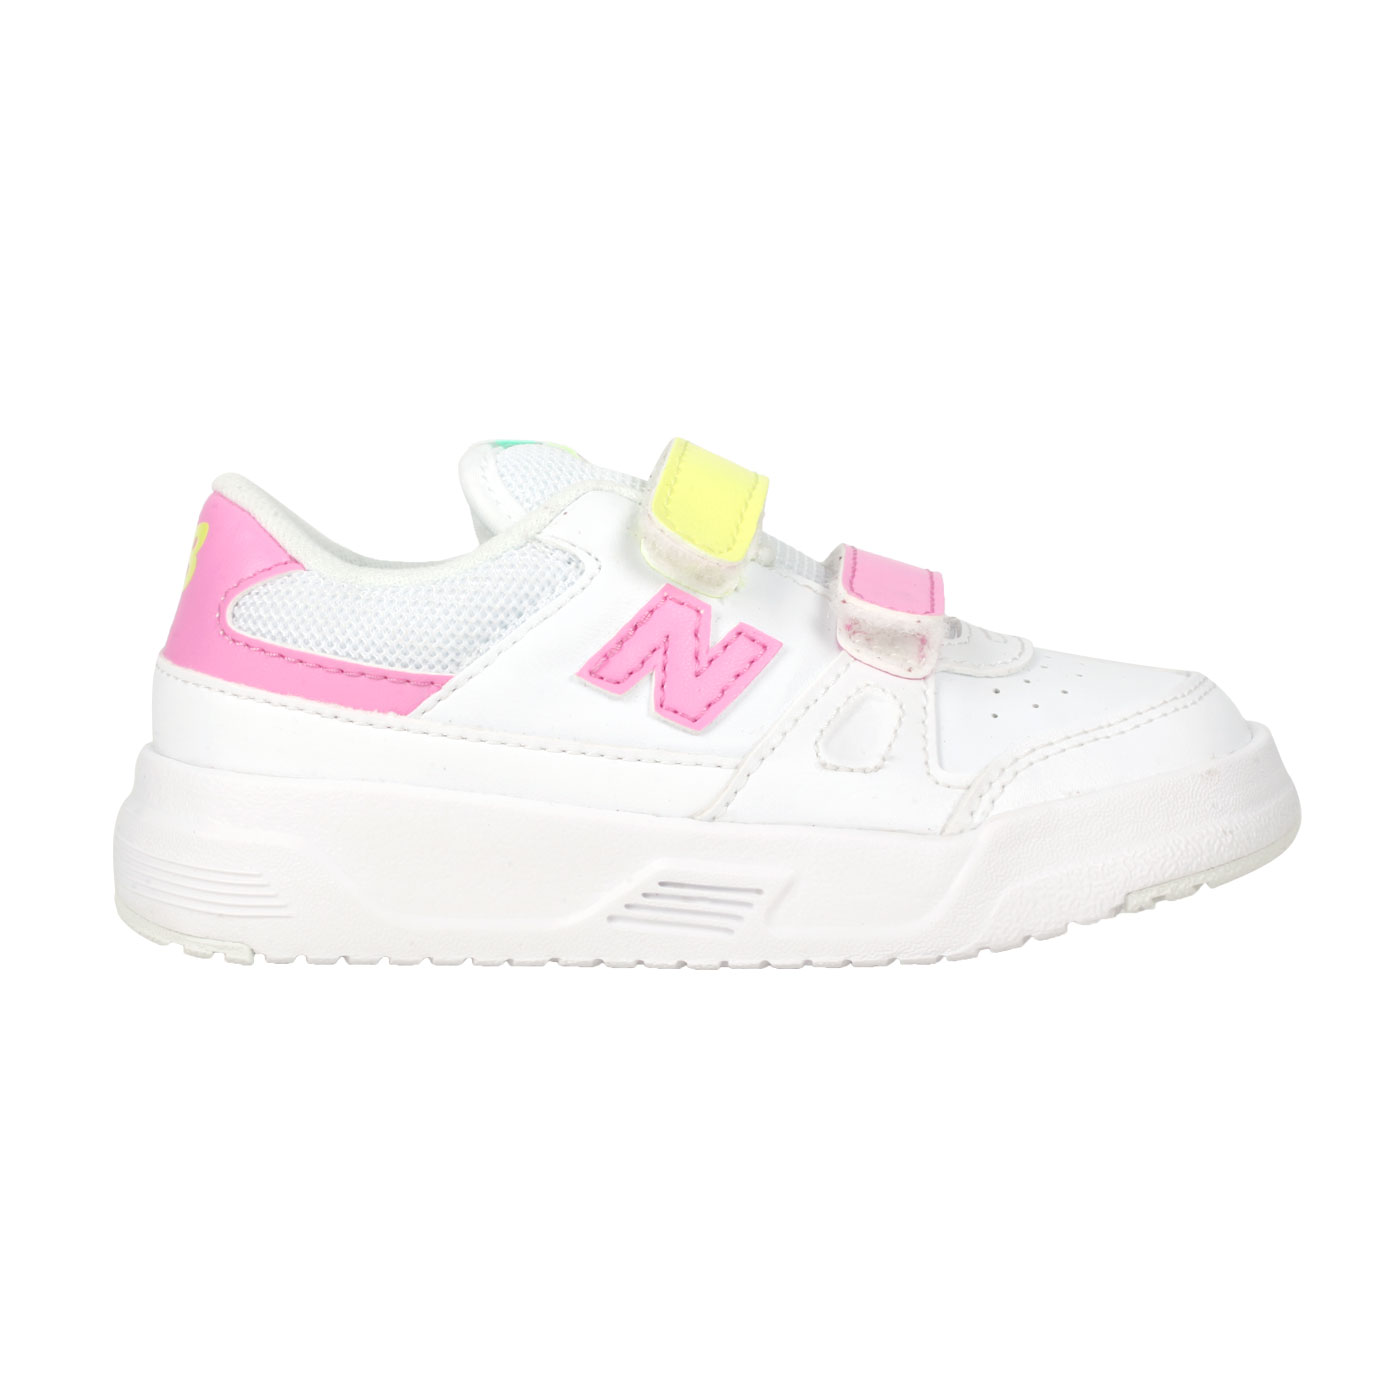 NEW BALANCE 小童運動休閒鞋-WIDE IVCT20WC